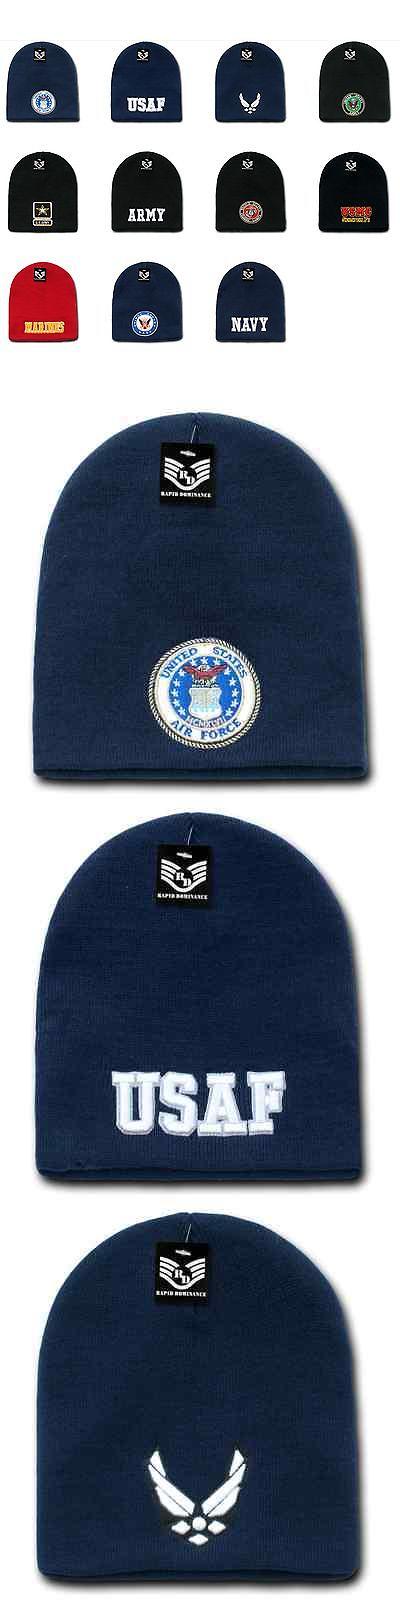 Mens Accessories 45053: 1 Dozen Embroidered Military Short Beanie Beanies  Knit Caps Cap Hats Wholesale